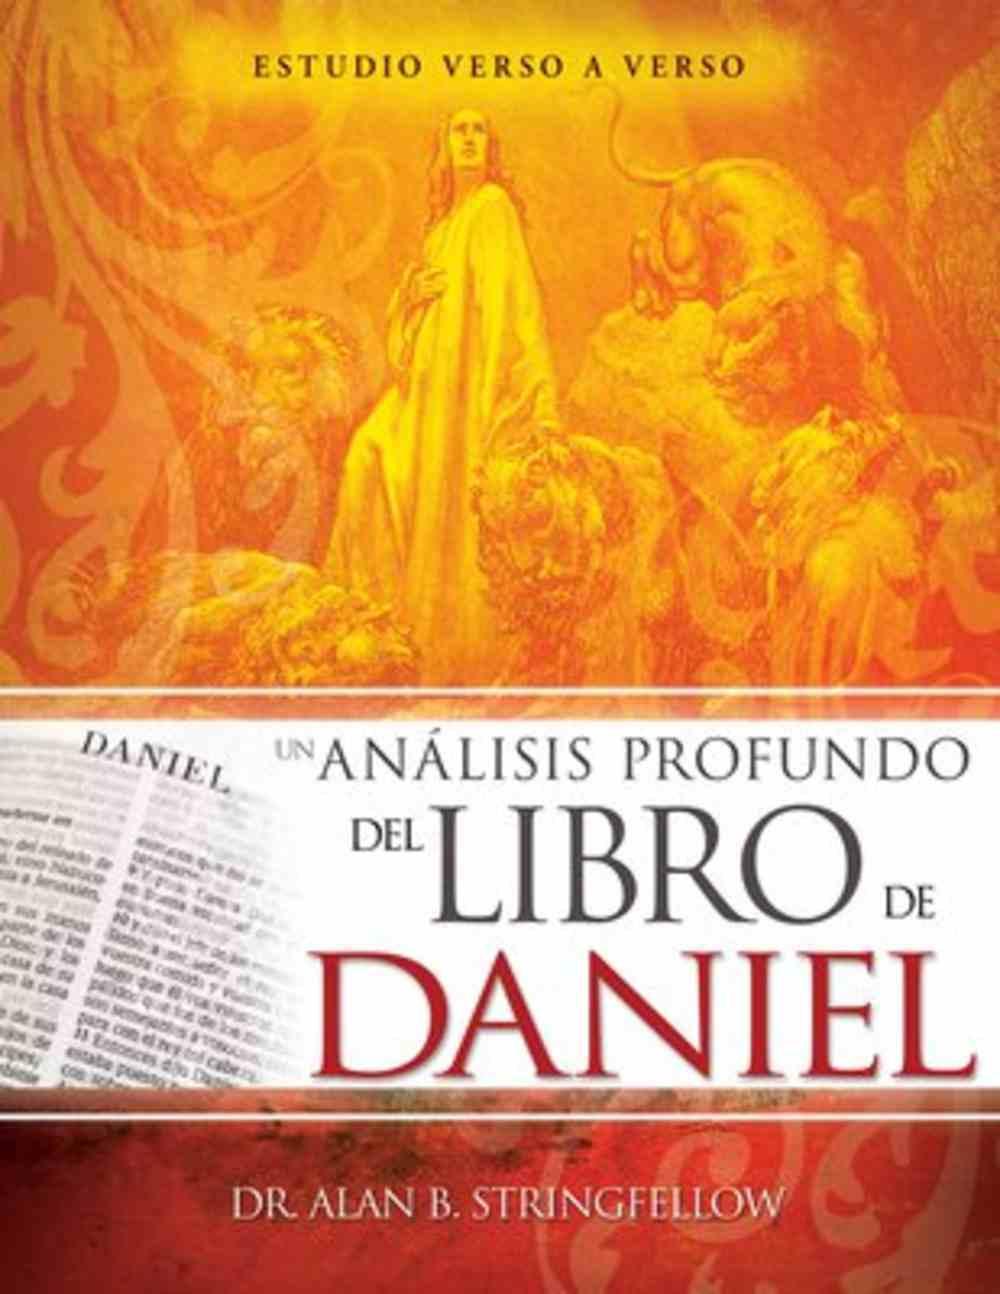 Analisis Profundo Del Libro De Daniel, Un: Estudio Verso a Verso (Insights Into The Book Of Daniel) Paperback